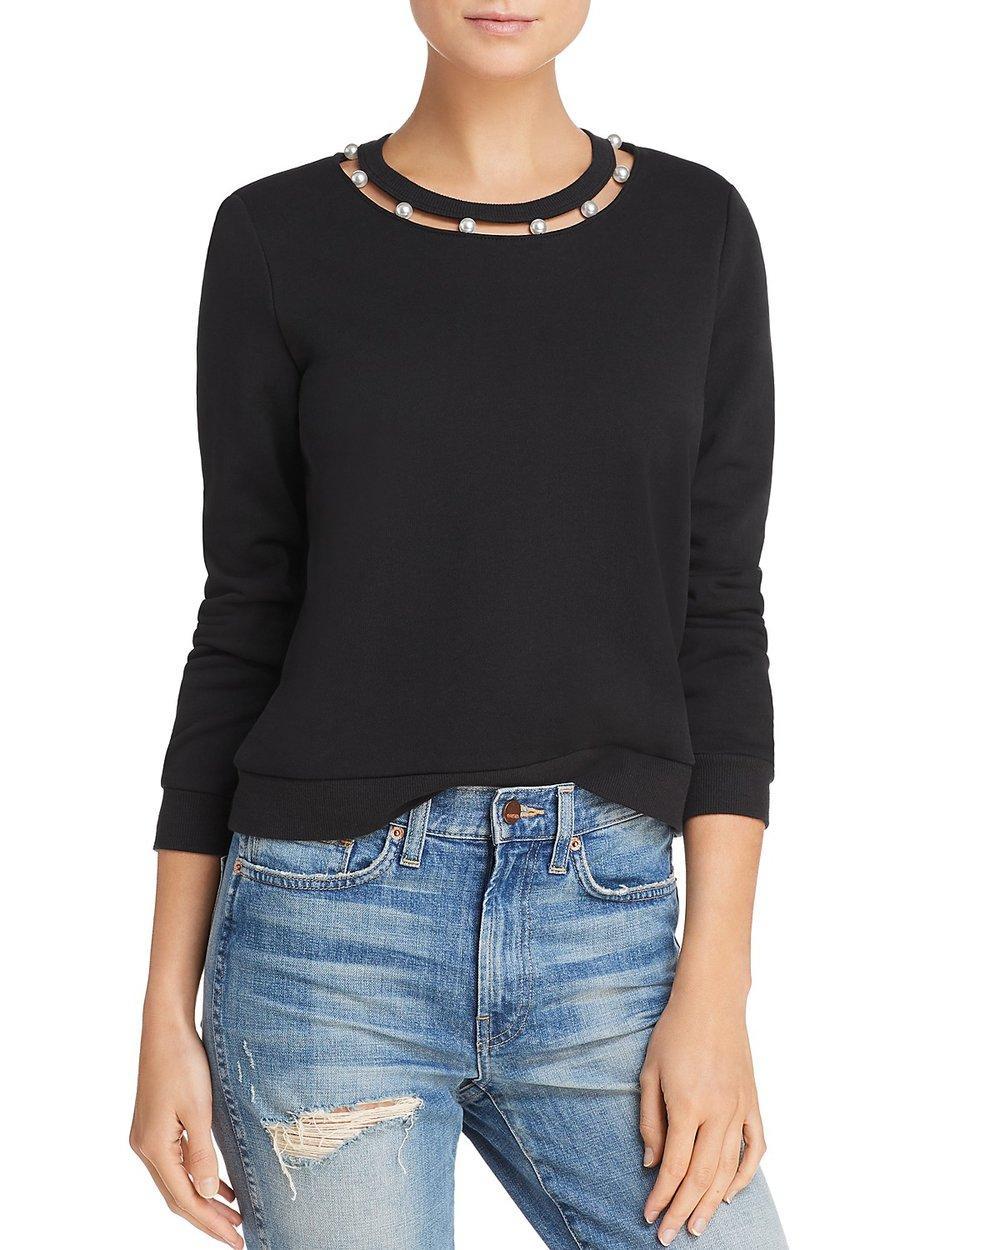 REBECCA MINKOFF Faux-Pearl collar sweatshirt, $98 Bloomingdales.com